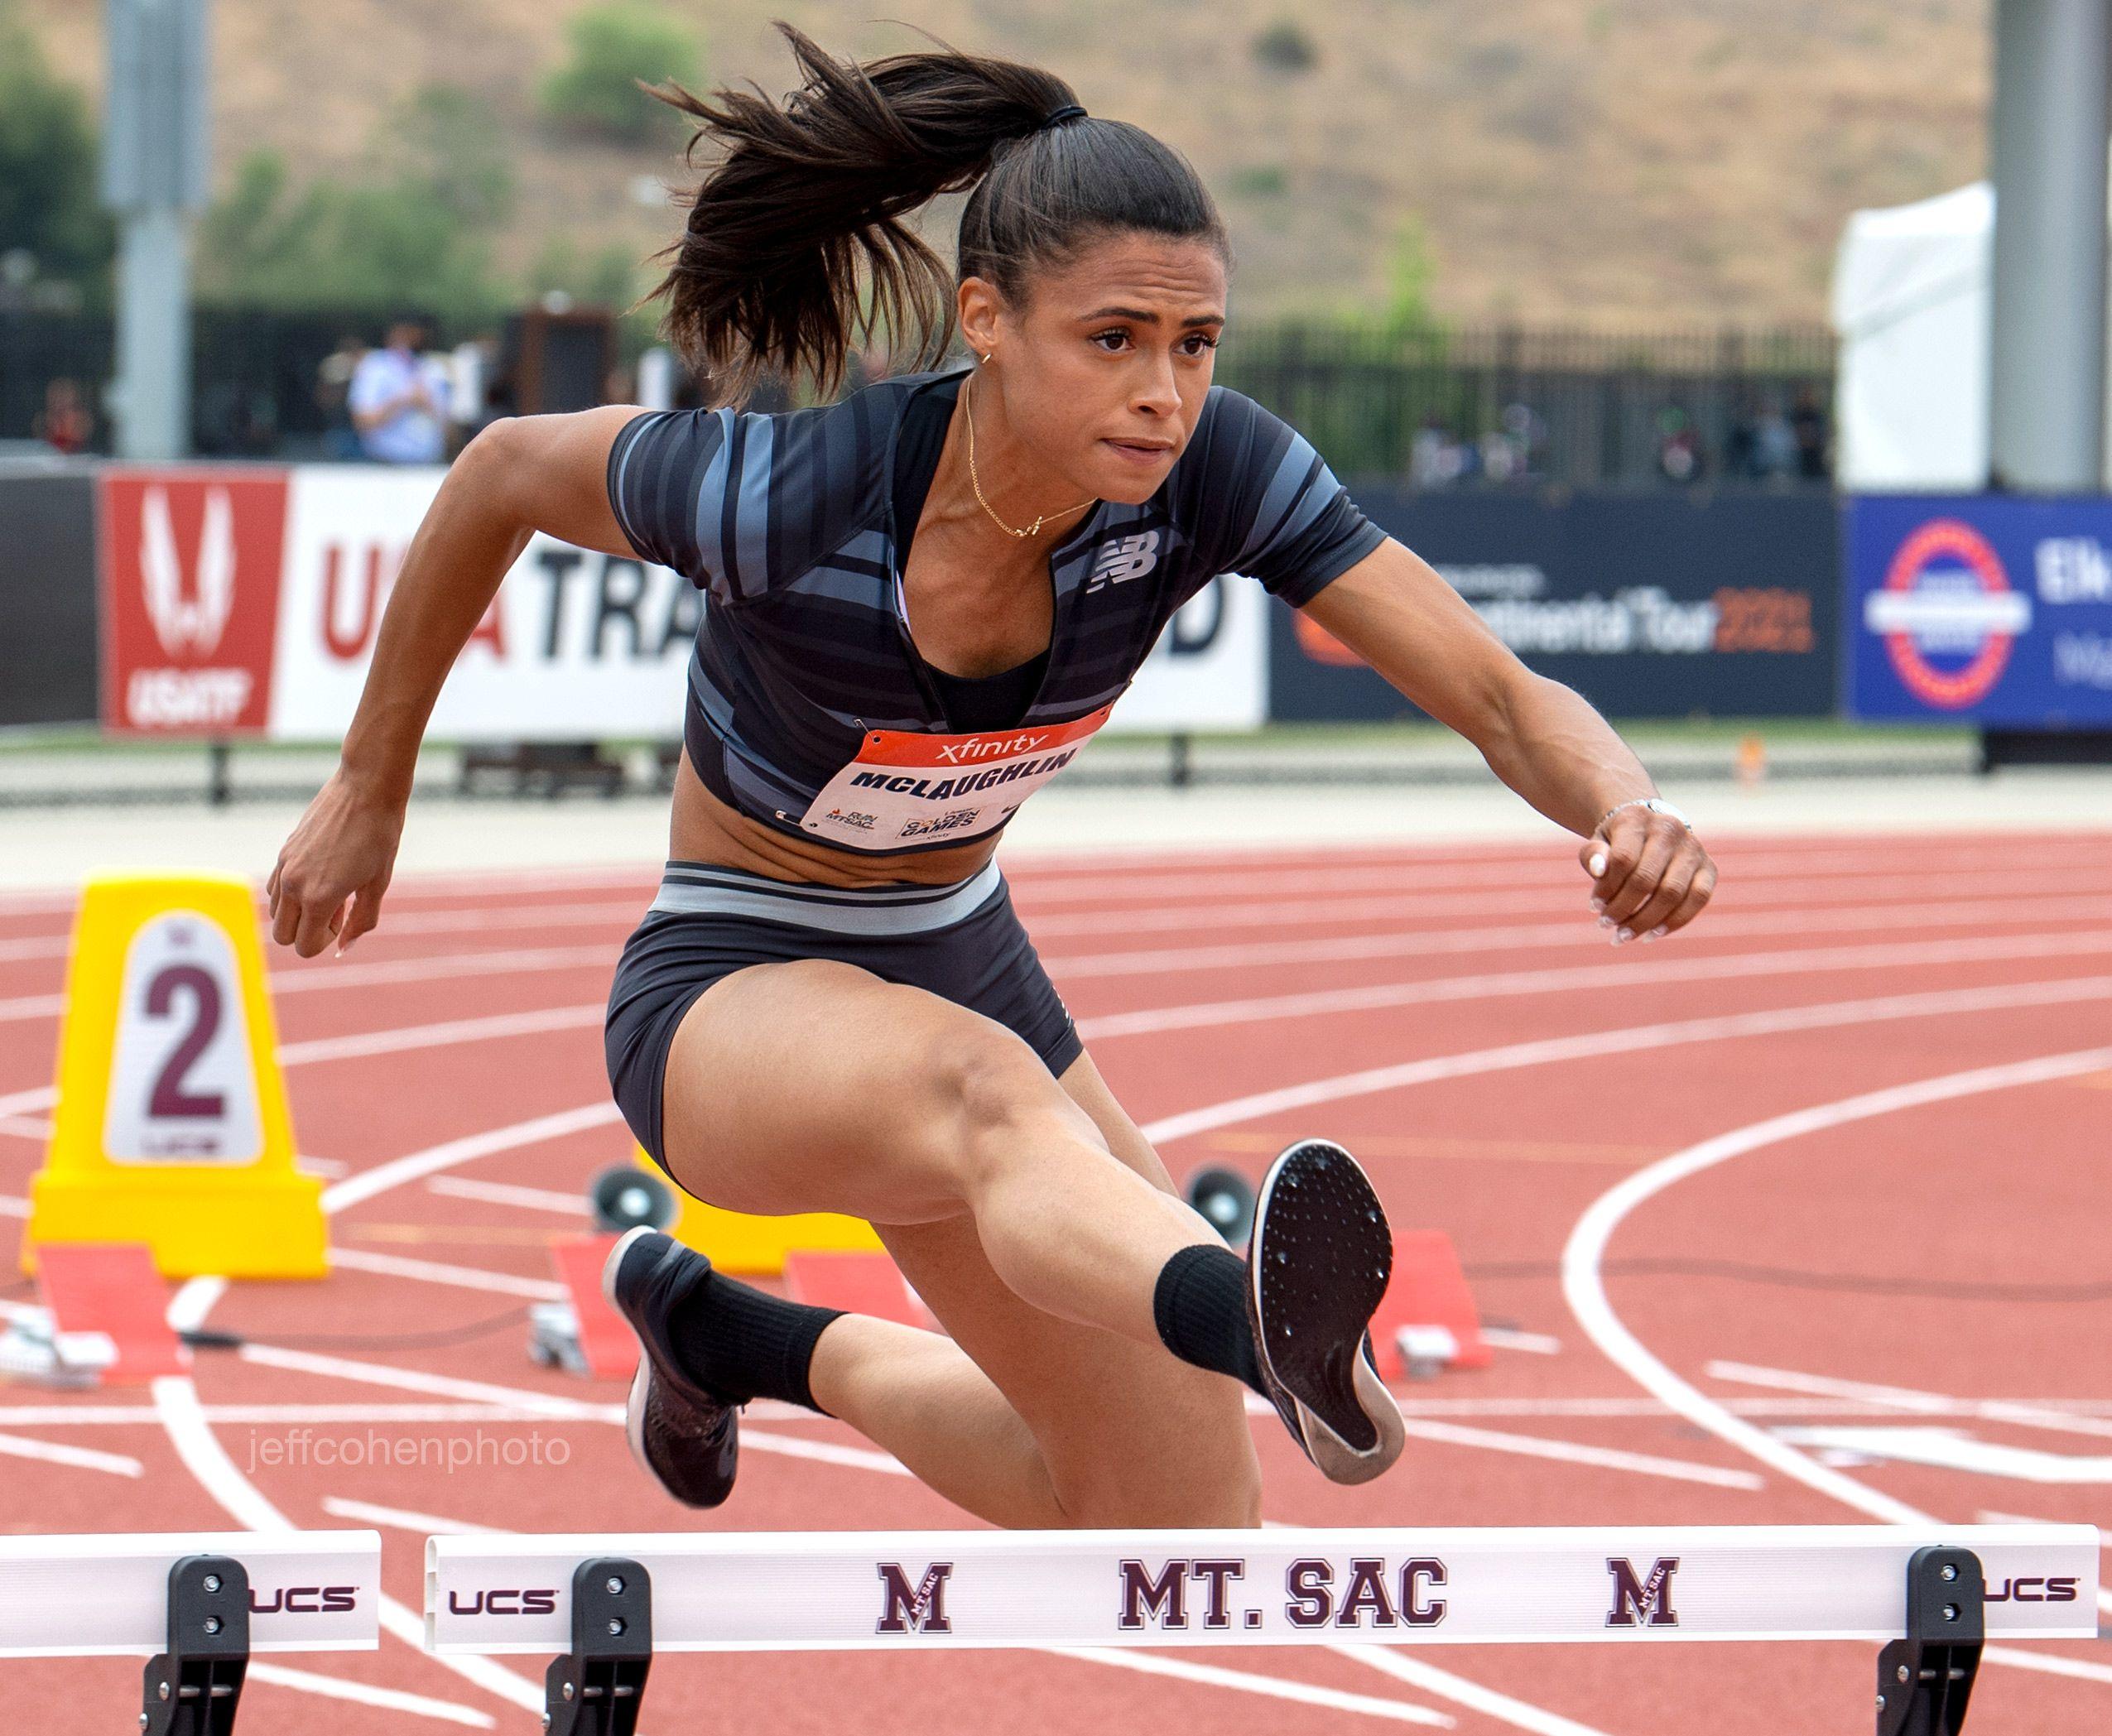 Sydney Mclaughlin, 100 meter hurdles, 2021 USATF GOLDEN GAMES